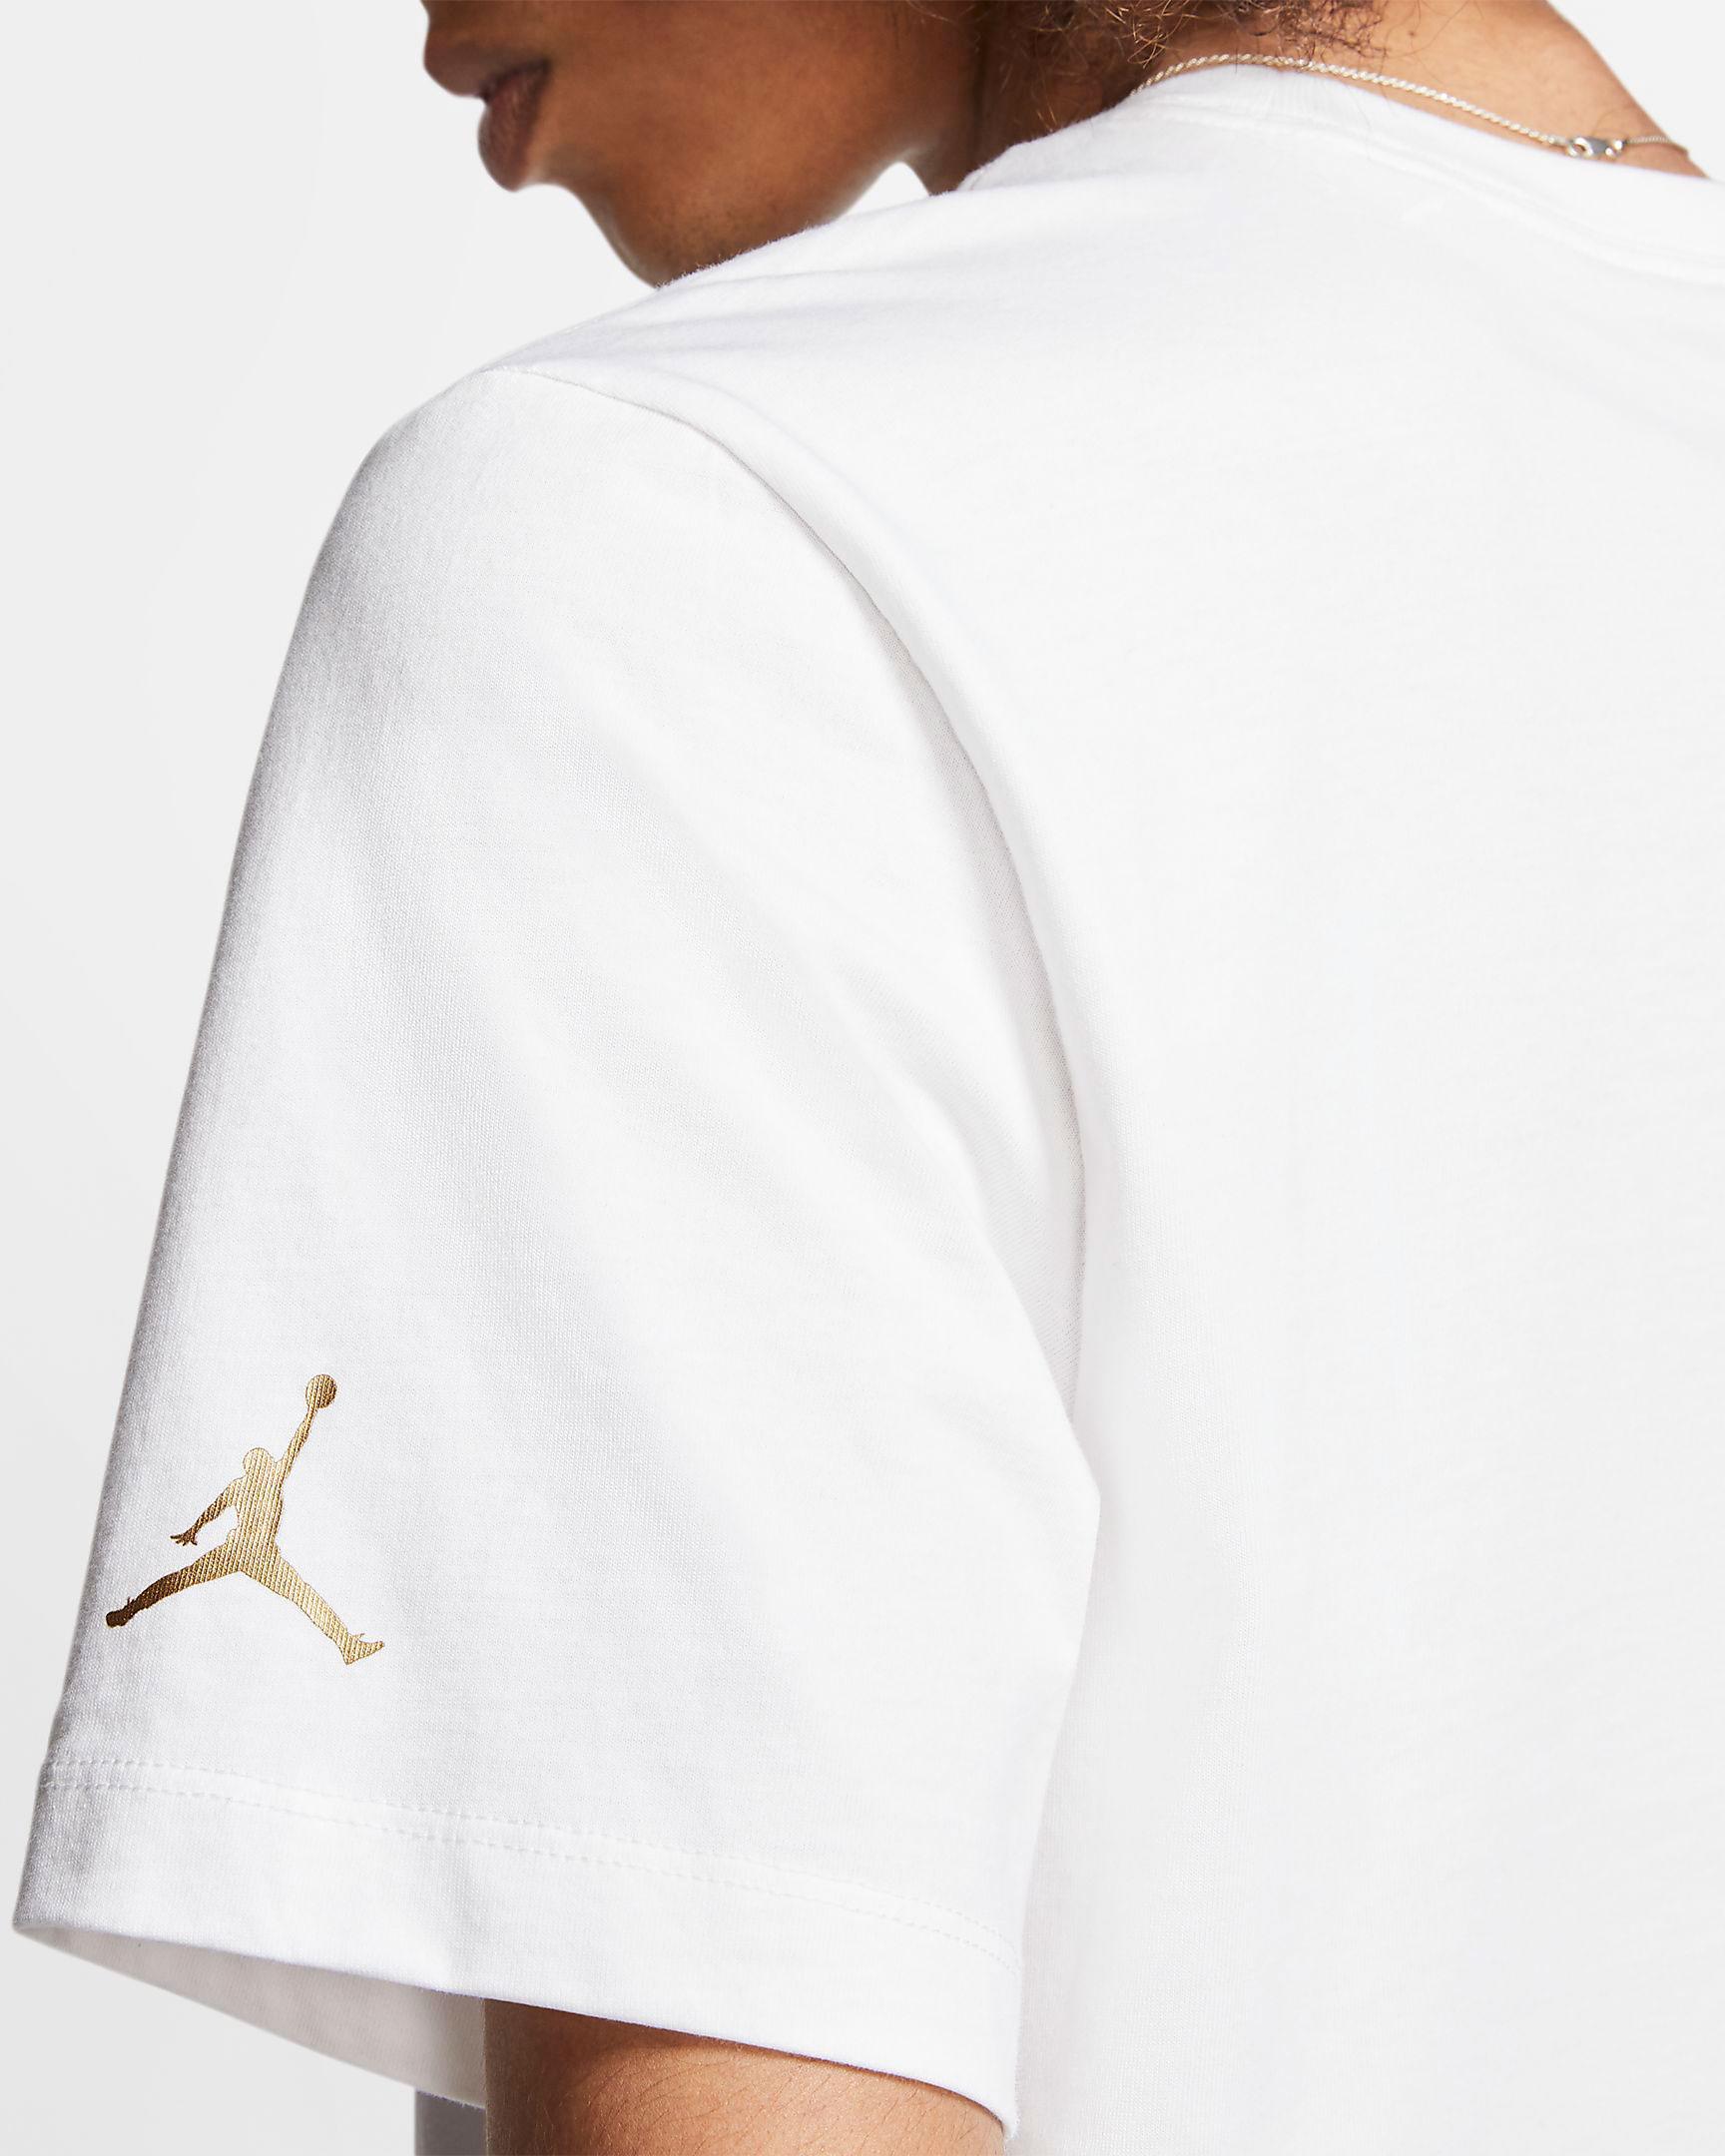 air-jordan-reflections-of-a-champion-tee-shirt-2